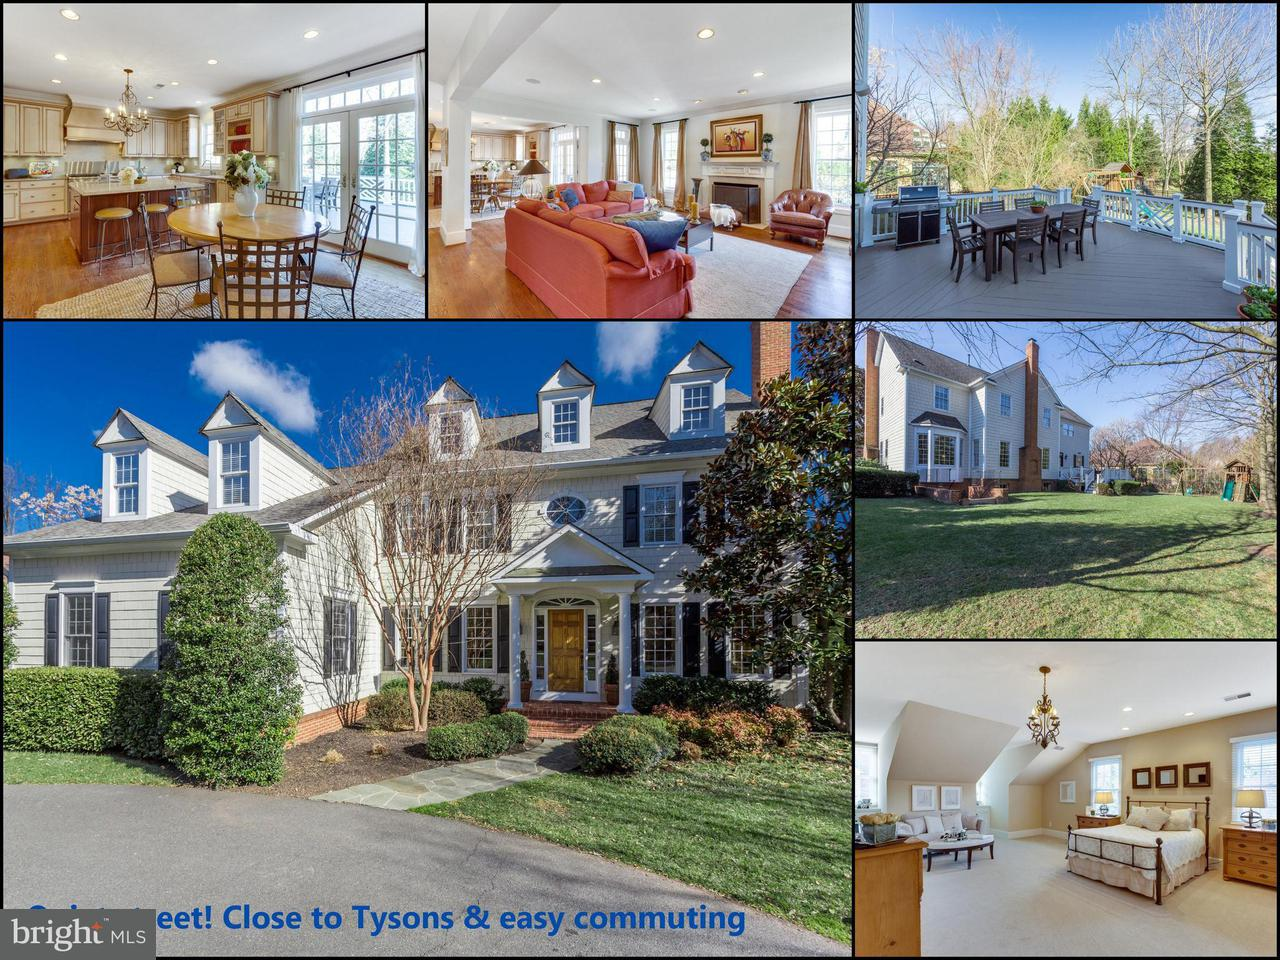 Single Family Home for Sale at 8308 Randwood Street 8308 Randwood Street McLean, Virginia 22102 United States